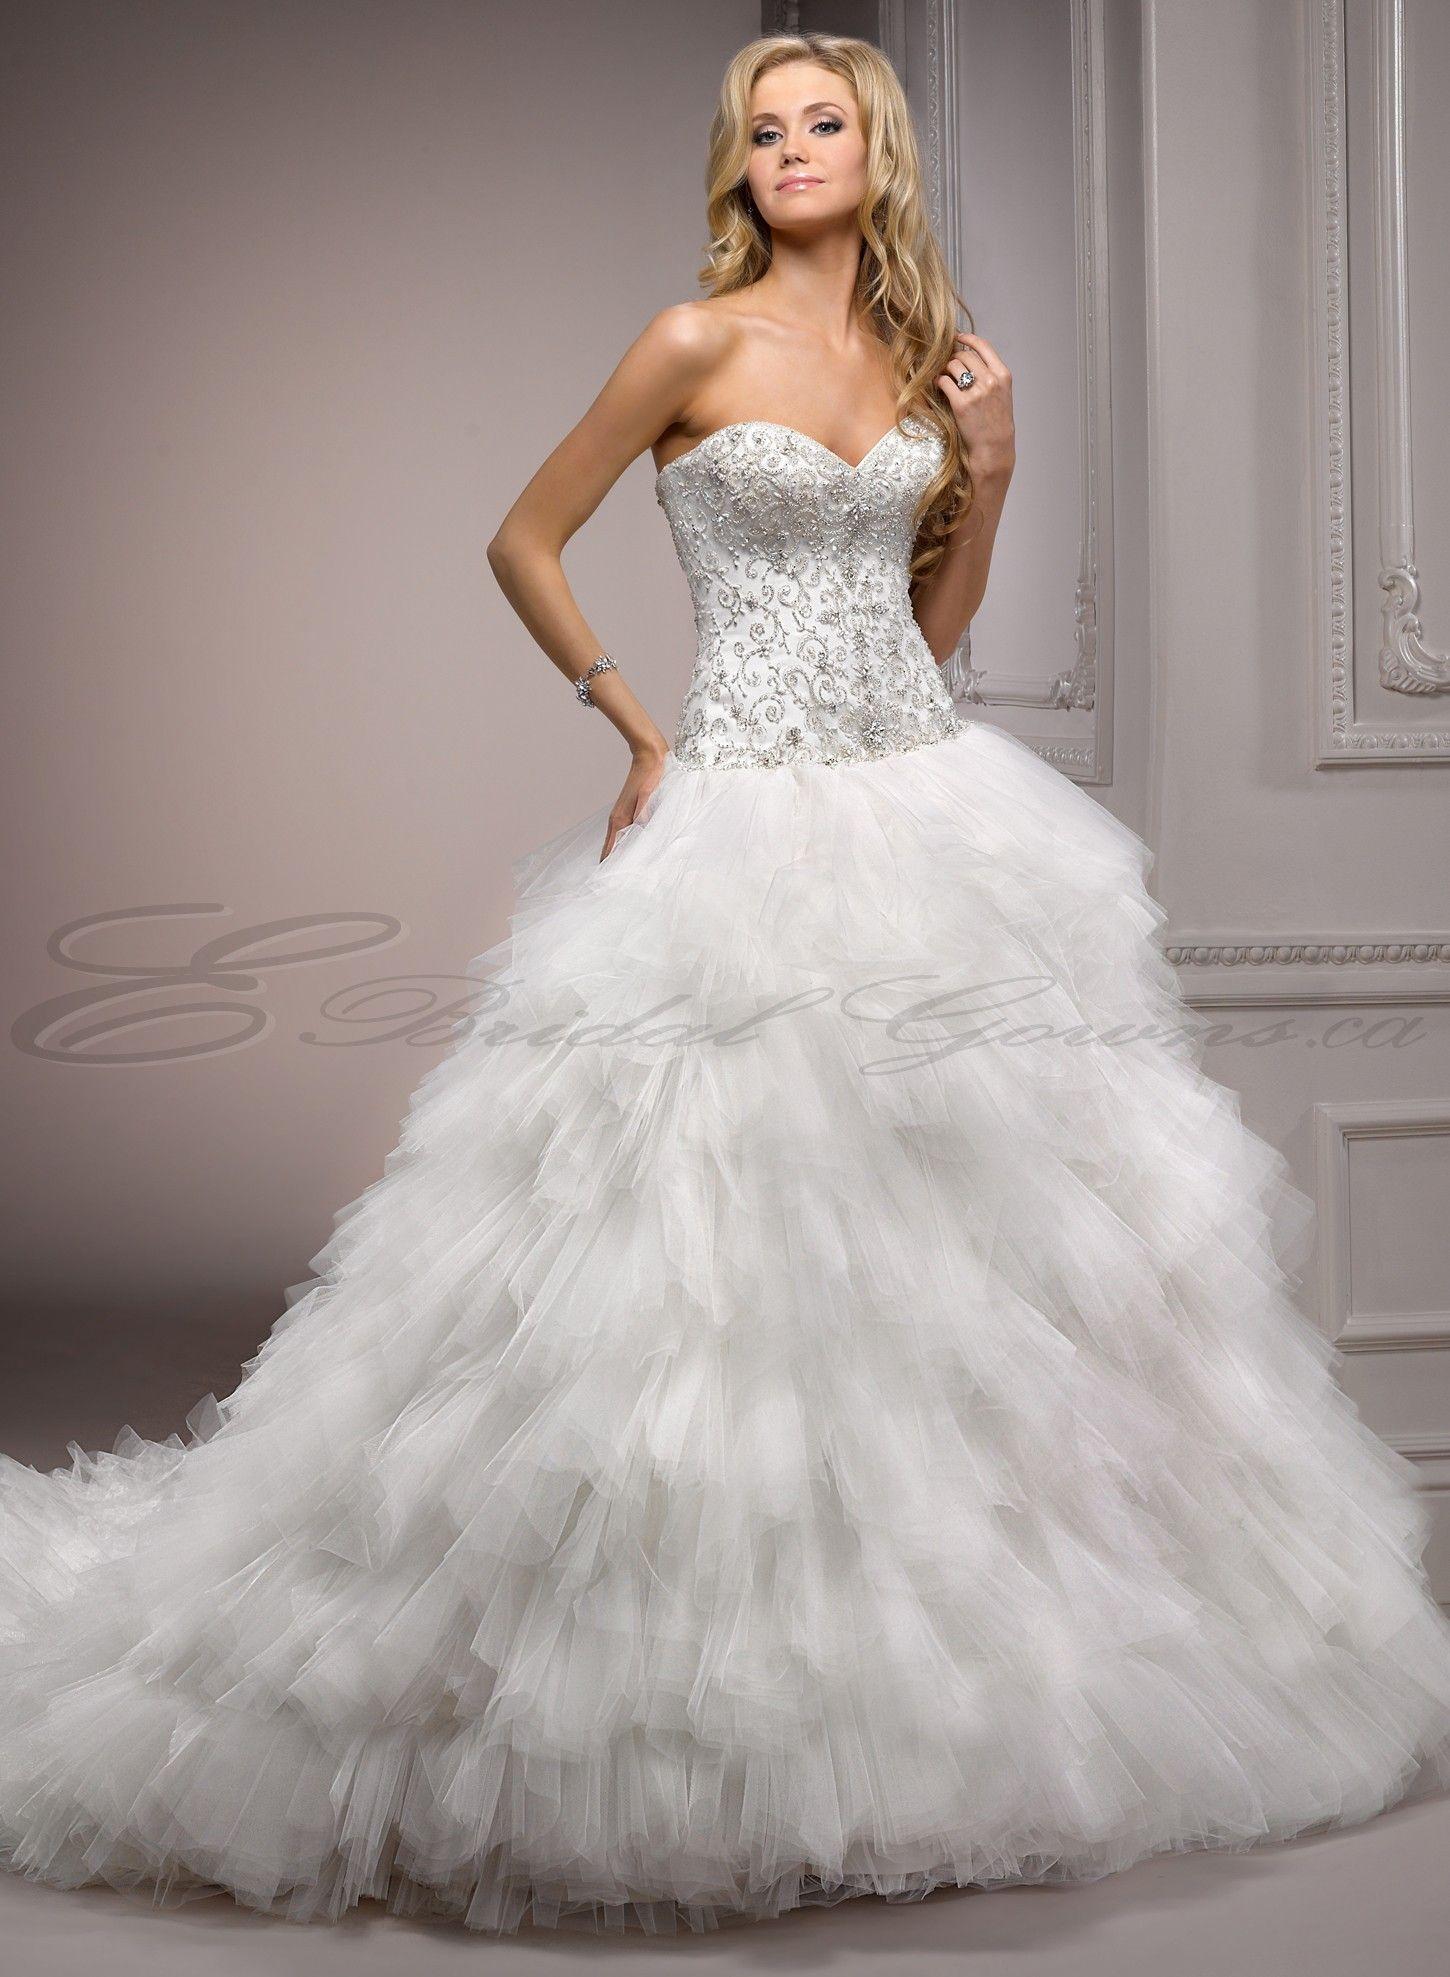 Wedding dress hd images